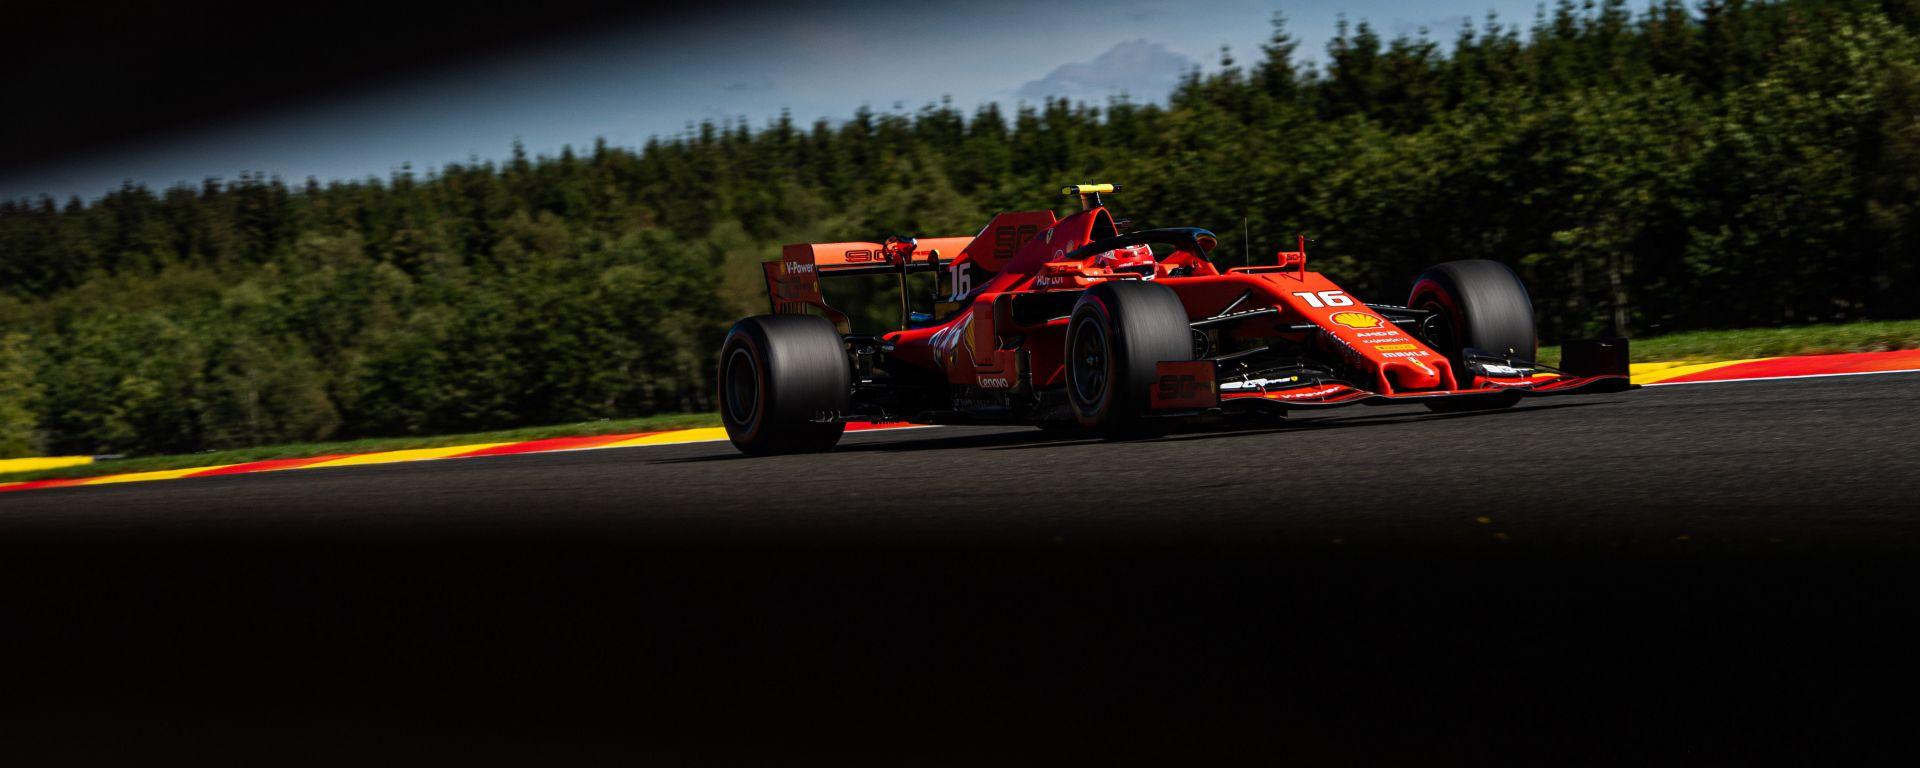 F1 GP Belgio 2020, Spa:  Charles Leclerc (Scuderia Ferrari)